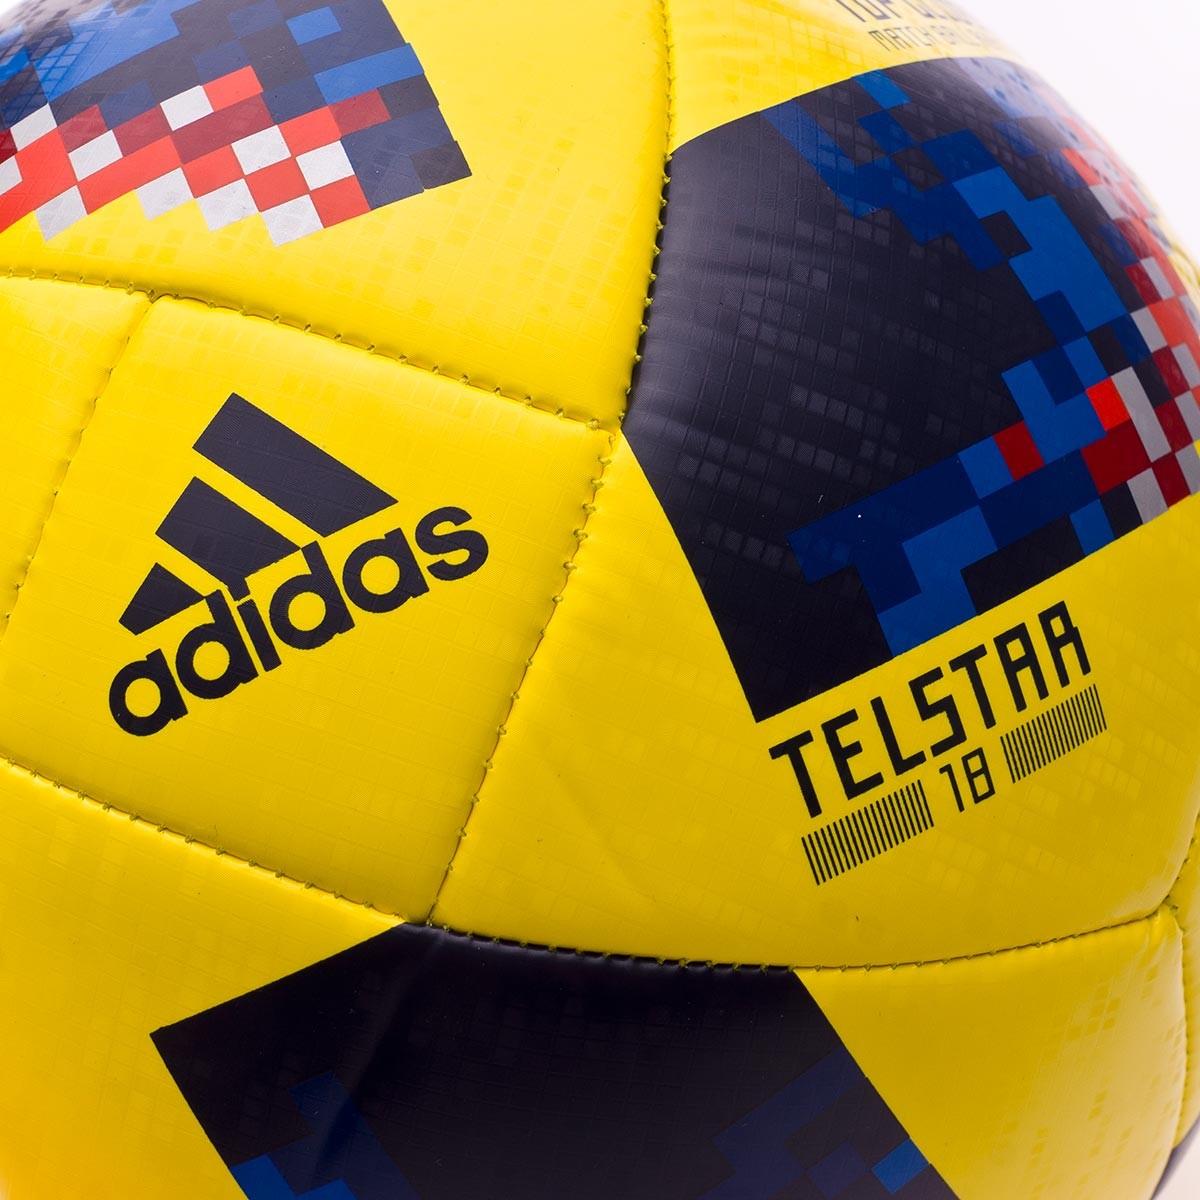 6b2c8711773 Ball adidas World Cup 18 Colombia Telstar 2017-2018 Yellow-Collegiate navy  - Tienda de fútbol Fútbol Emotion